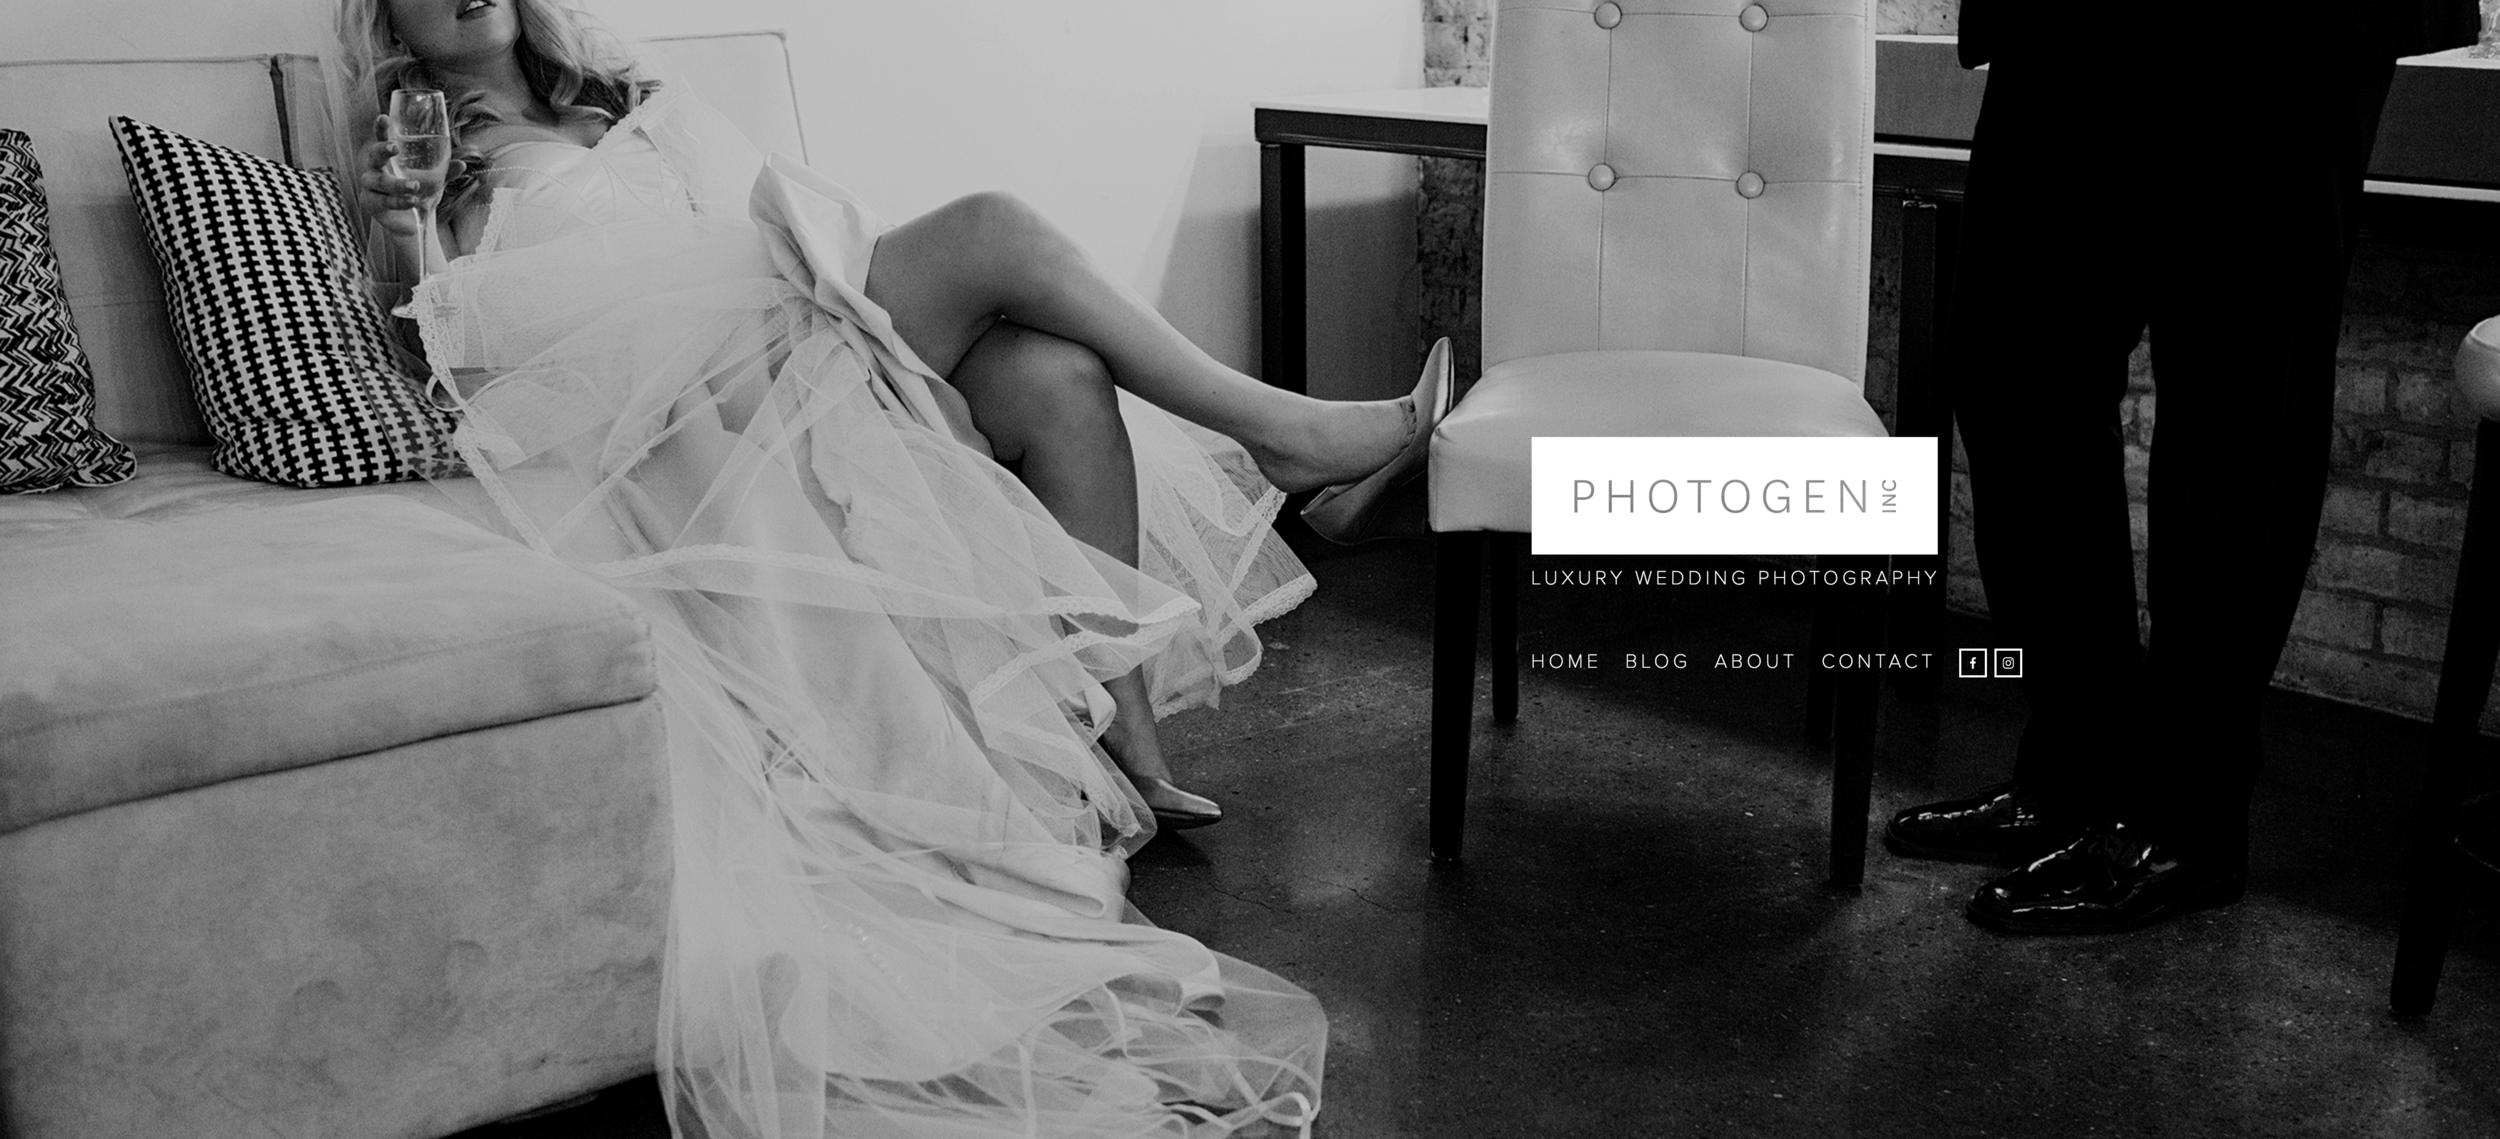 photogen-inc.com